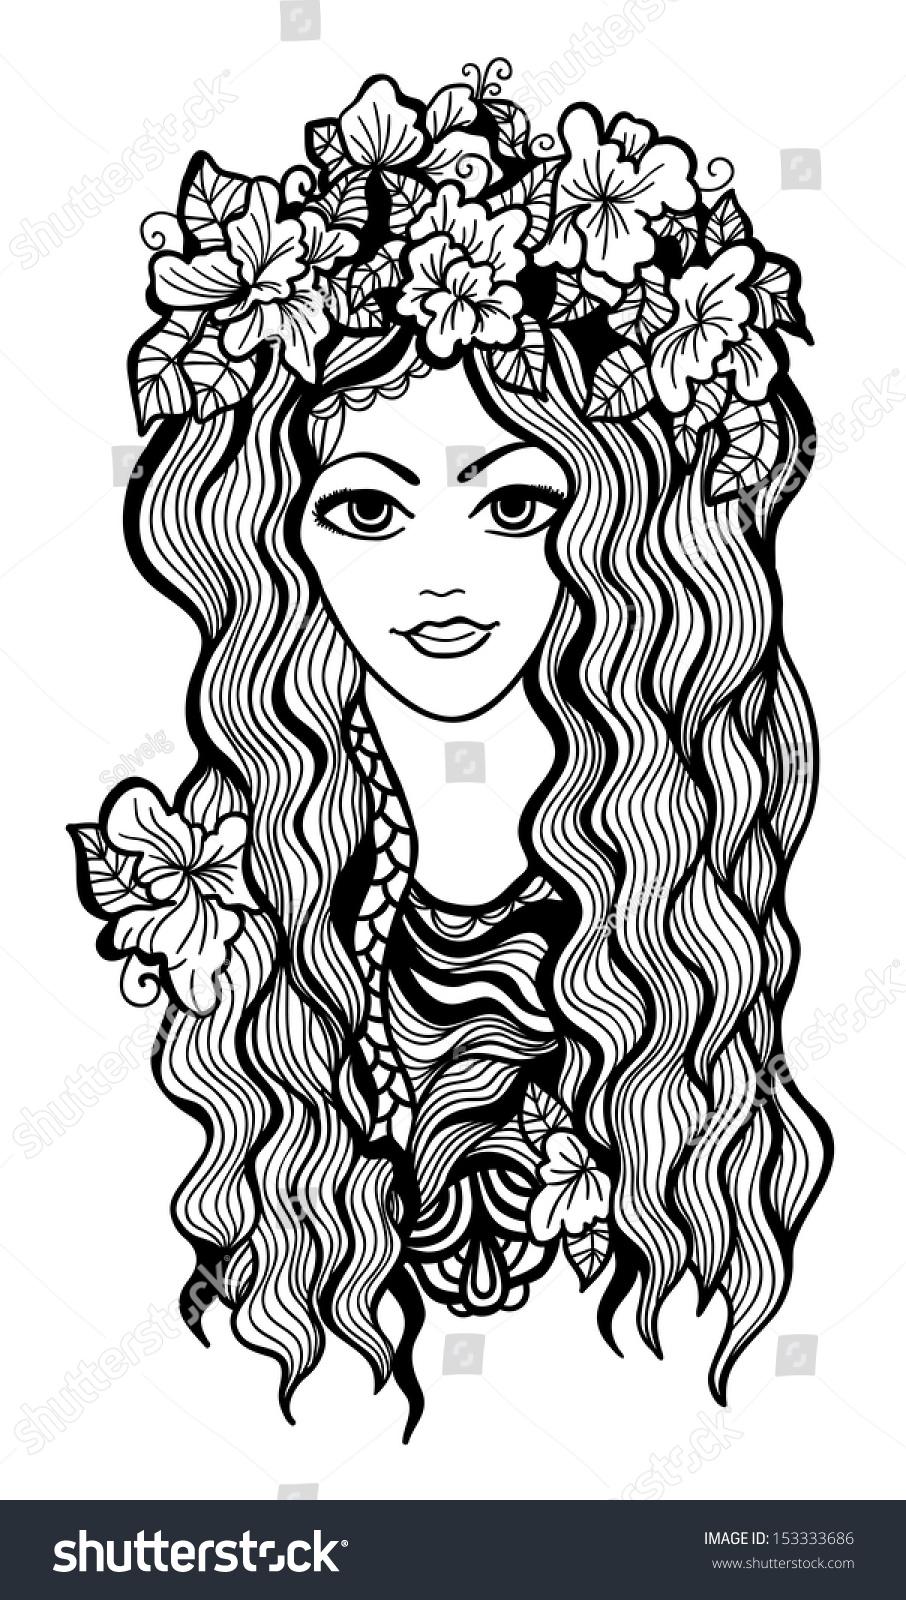 Beautiful Black White Girl Flower Crown Stock Illustration 153333686